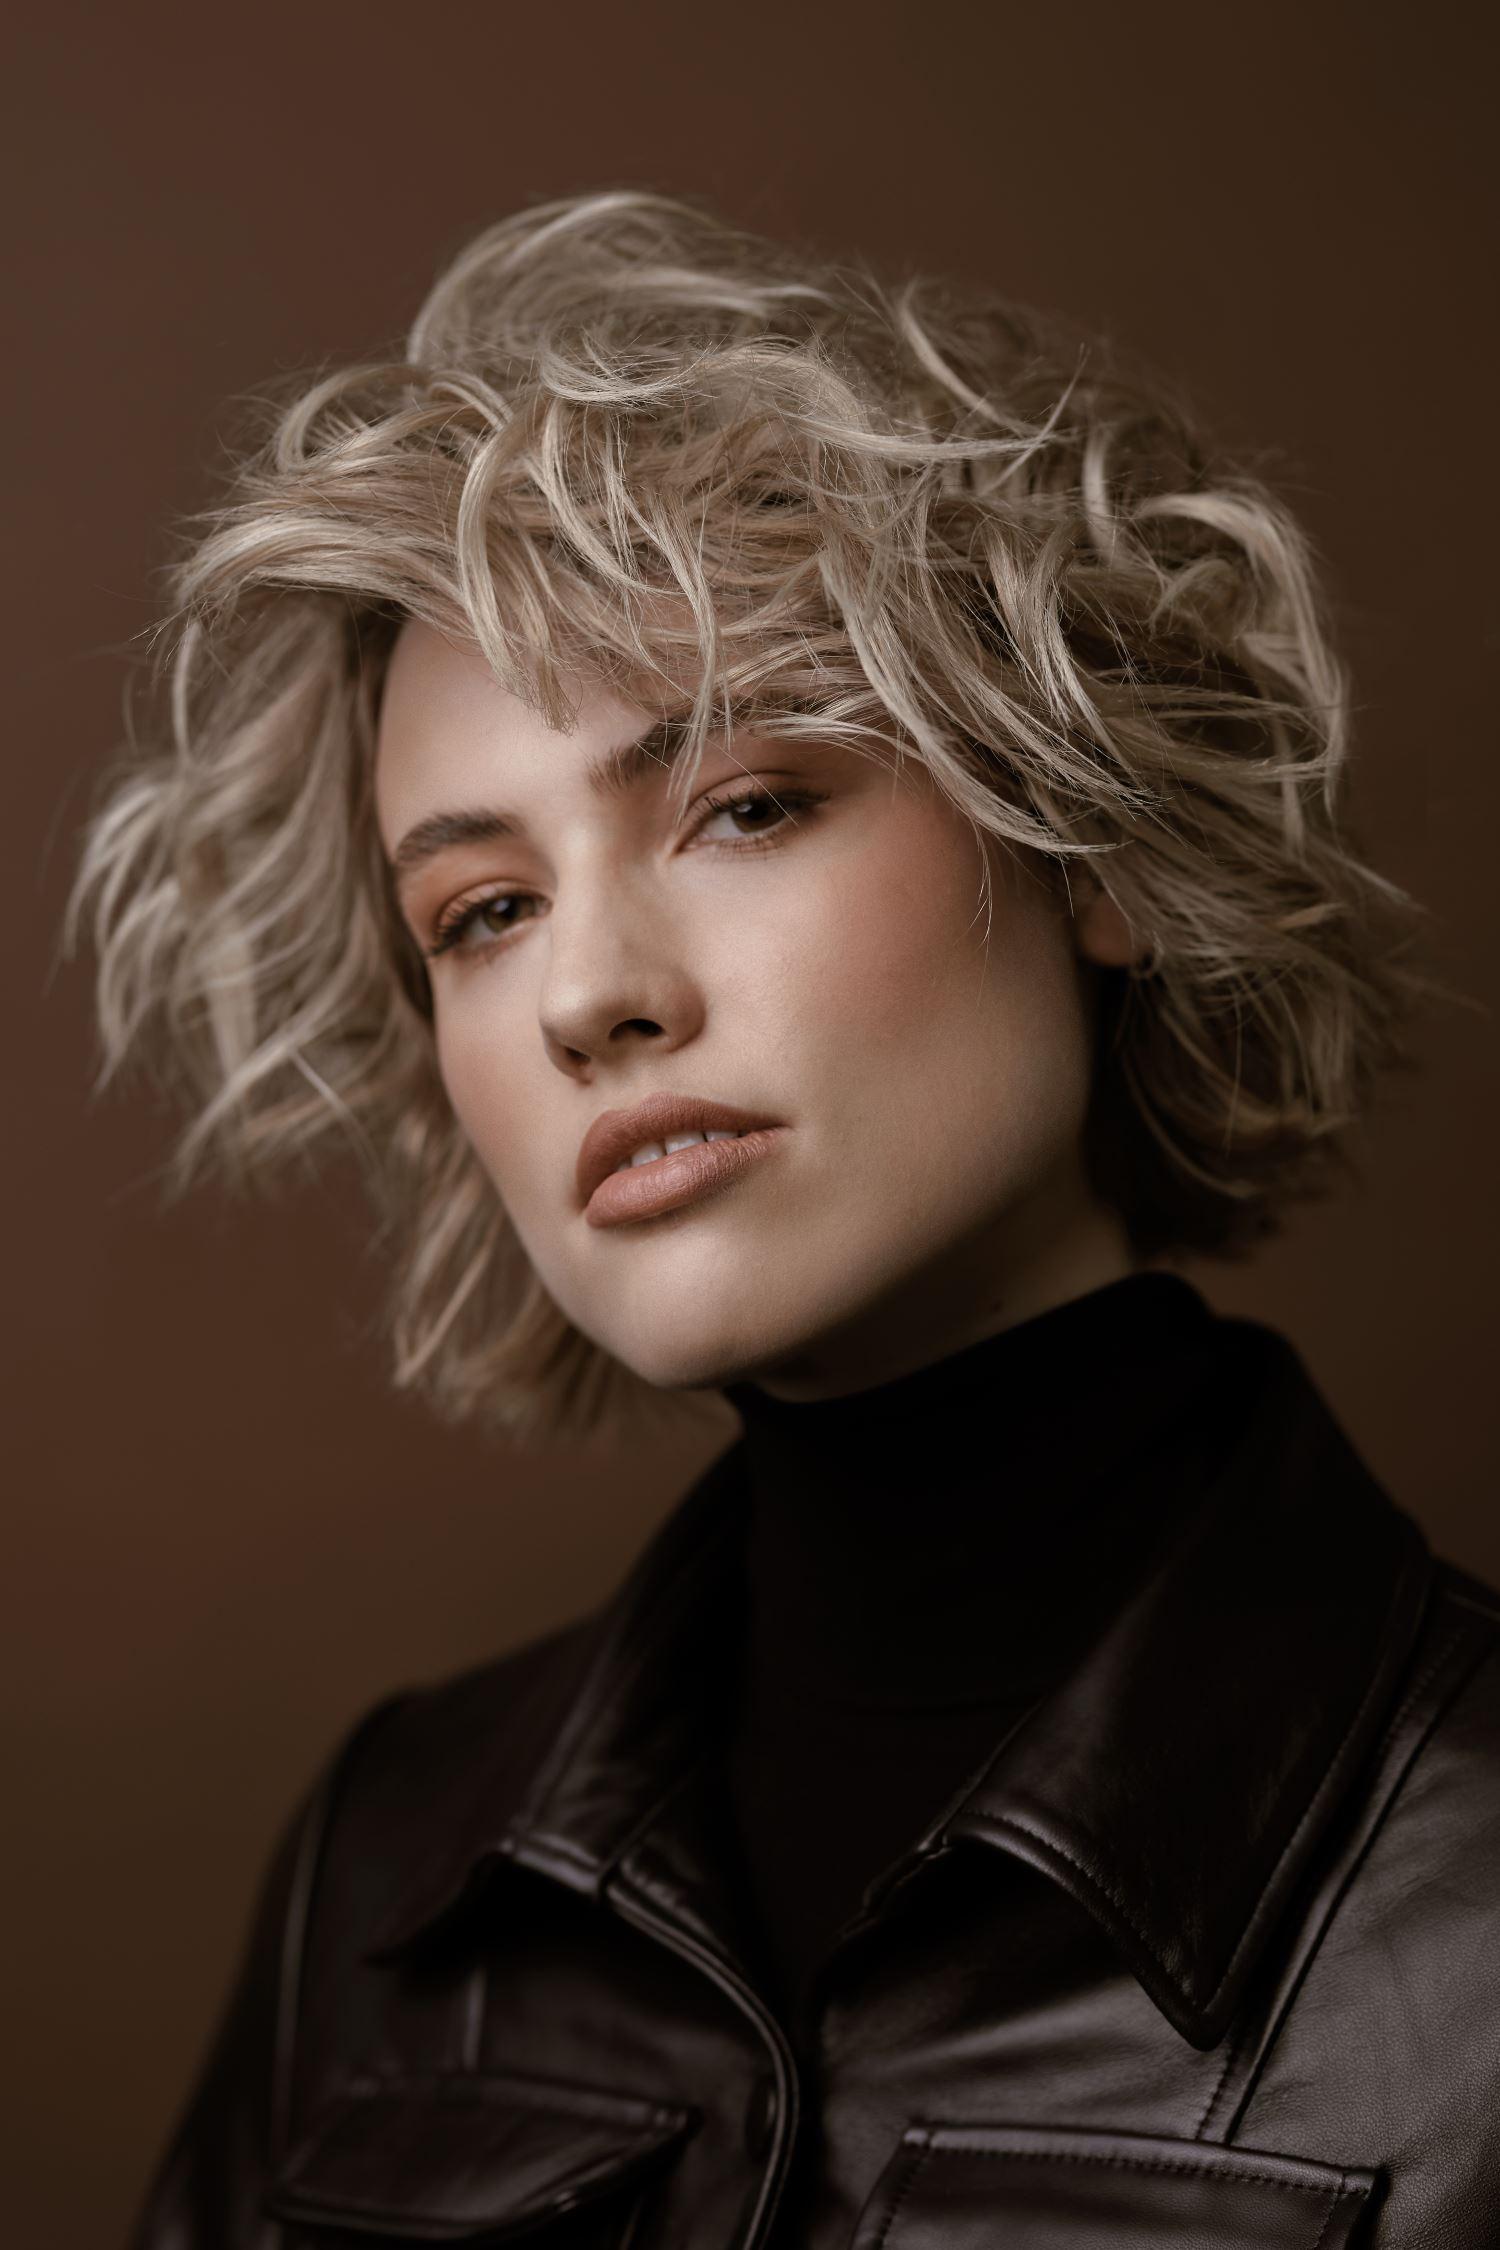 Salon Edinger Slider 30 Jahre Friseur Linz female model 1500 x 2250